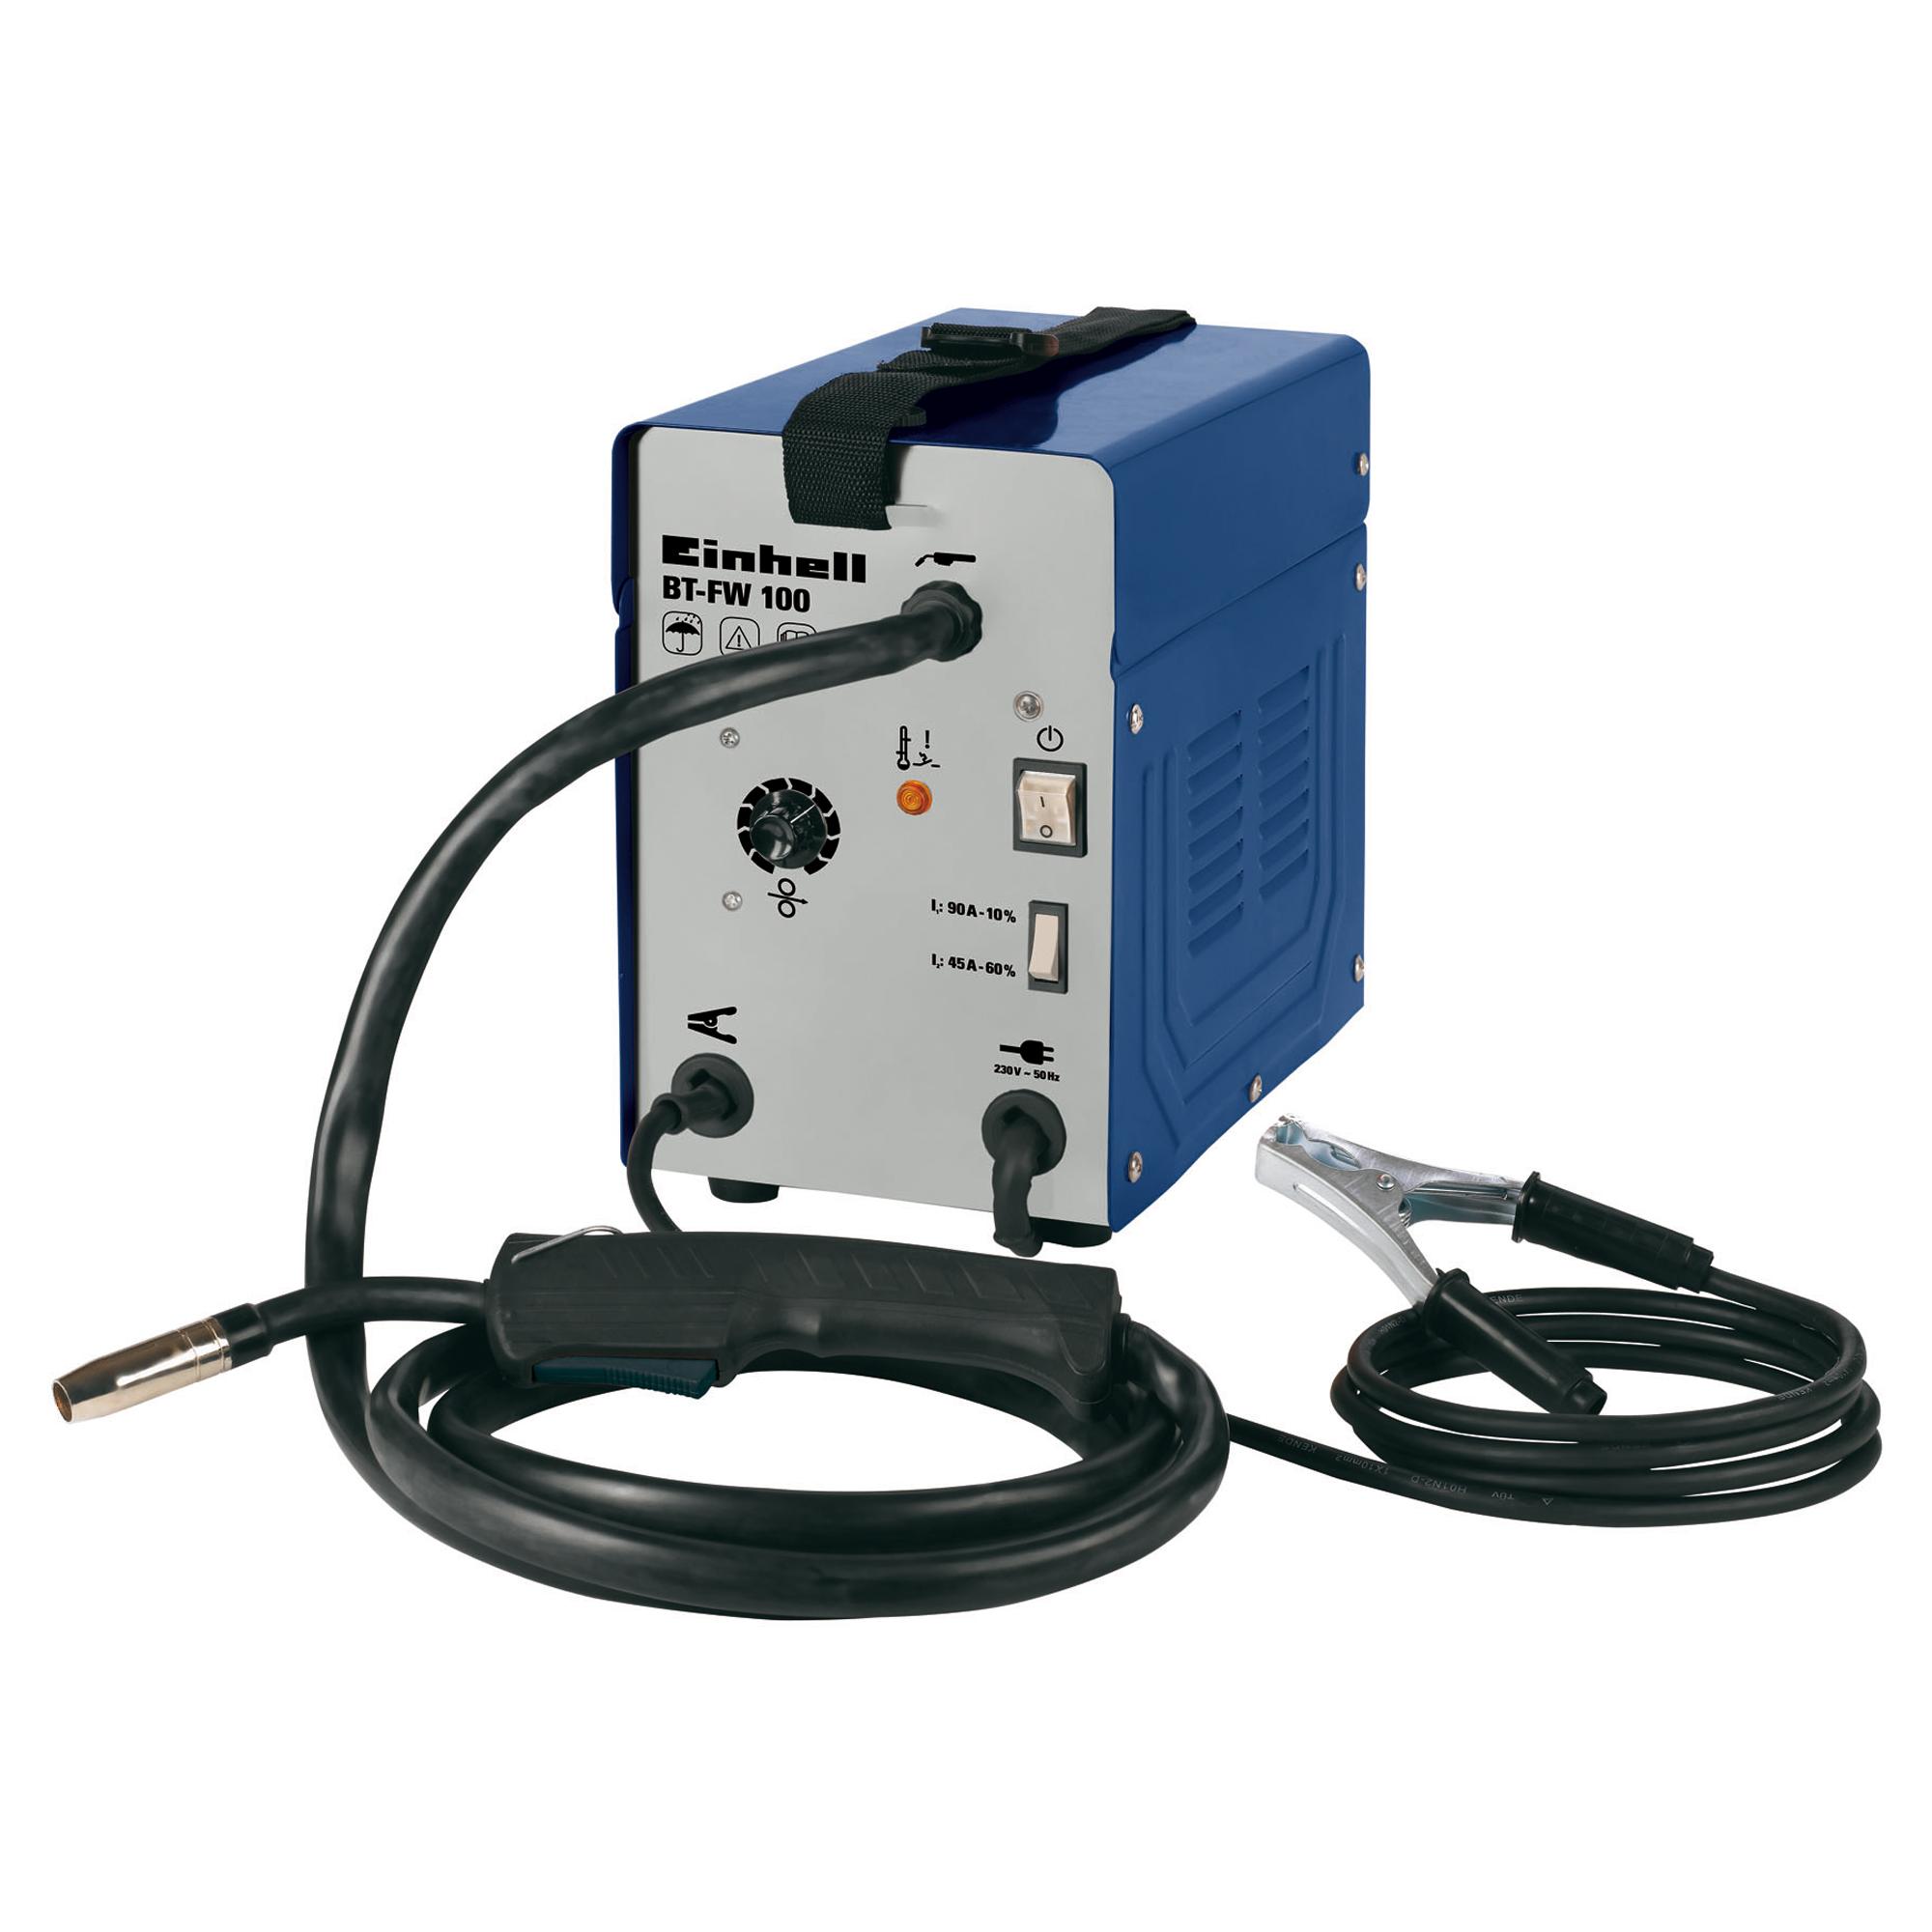 Fülldraht-Schweißgerät BT-FW 100 ǀ toom Baumarkt